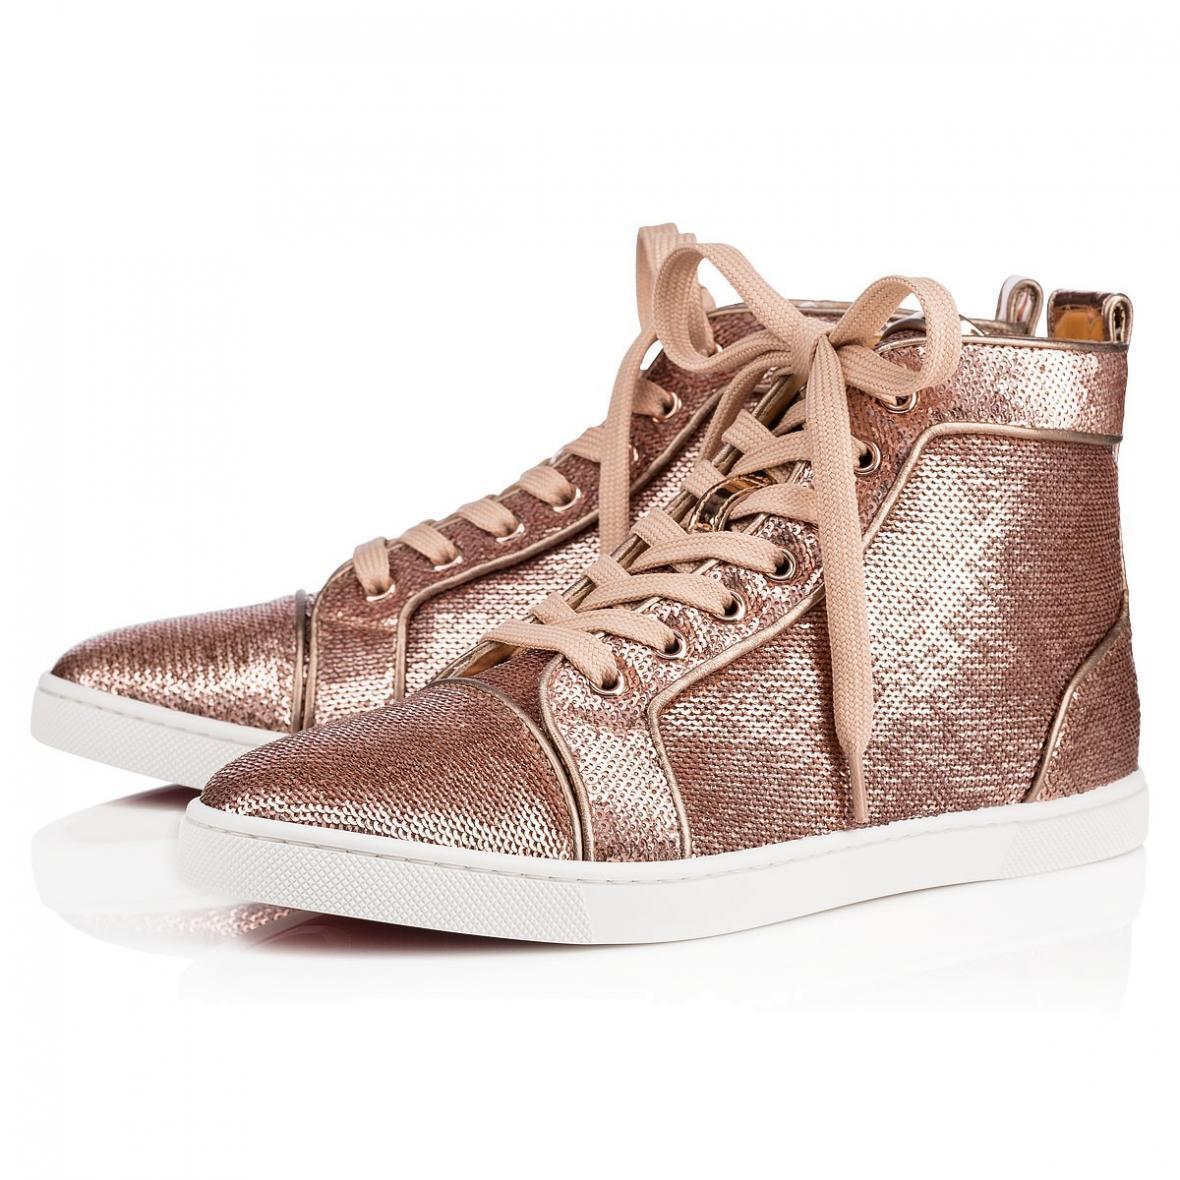 NB Pink Christian Louboutin Bip Bip Orlato Flat Nude Pink NB Sequin Hightop Sneaker 40.5 896d83